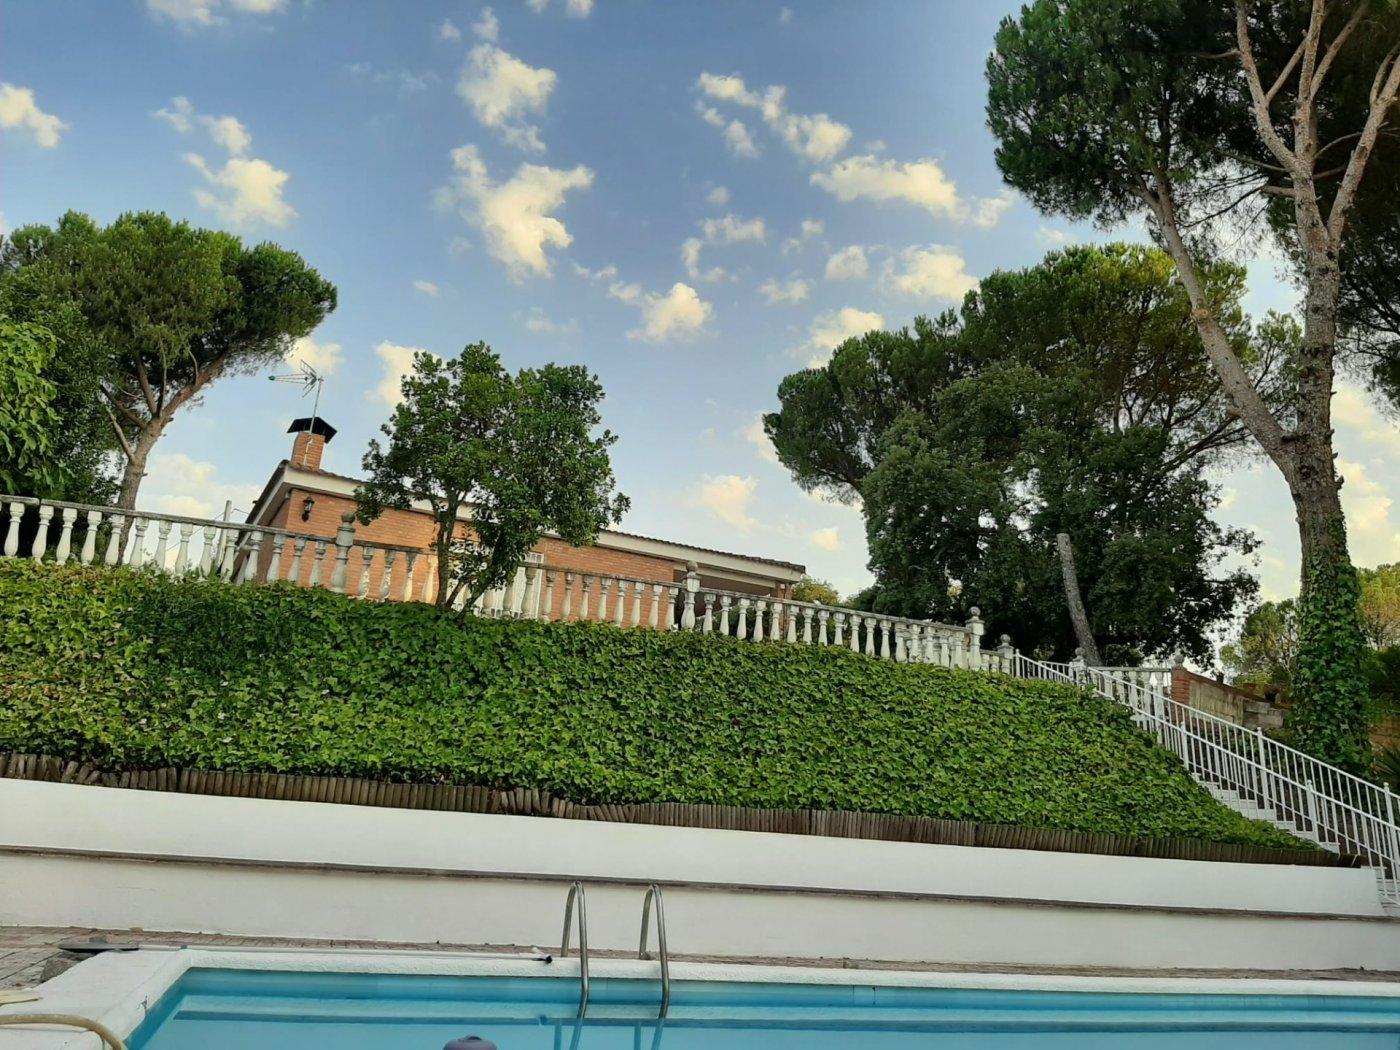 Estupenda casa con piscina propia en zona de assuan- las jaras-cÓrdoba. - imagenInmueble30